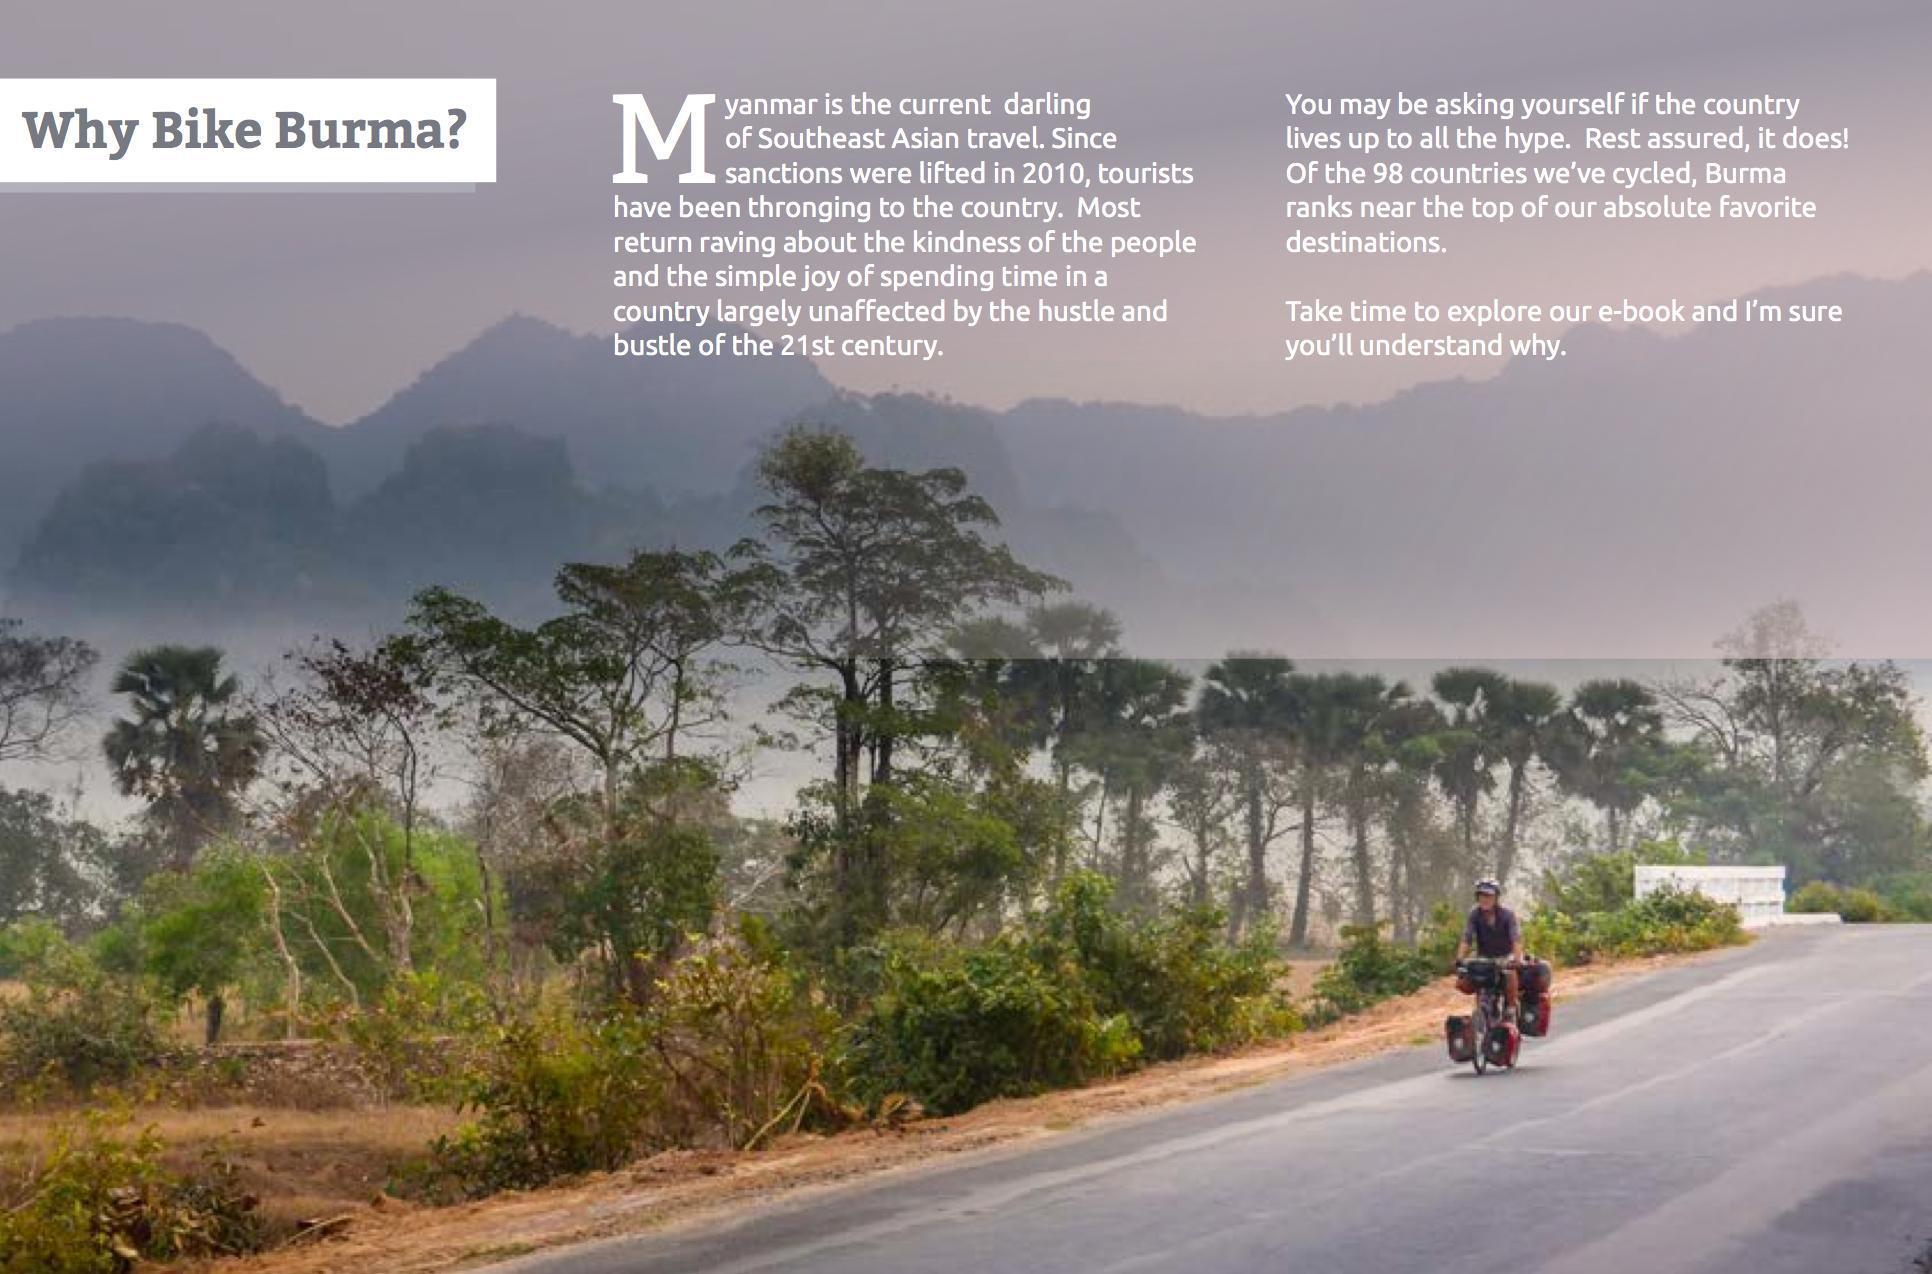 Why Burma by Bike